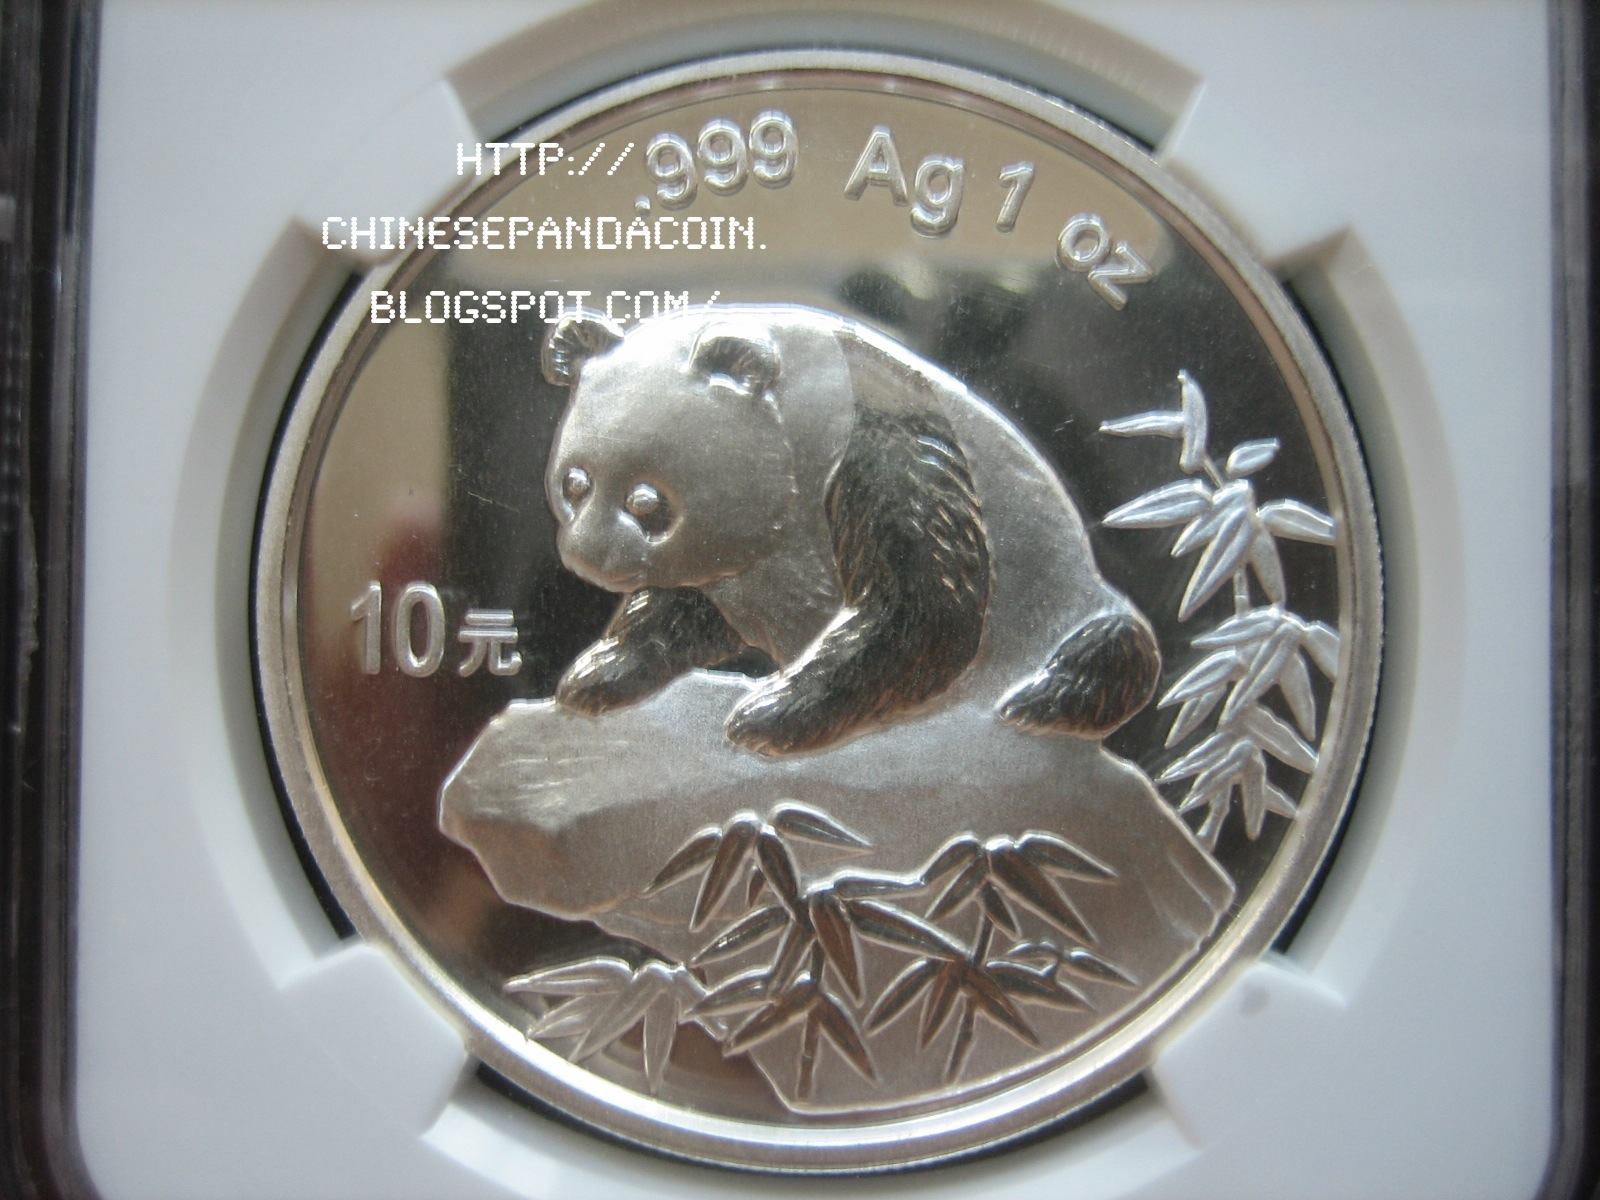 Chinese Panda Coin 1999 Chinese Silver Panda